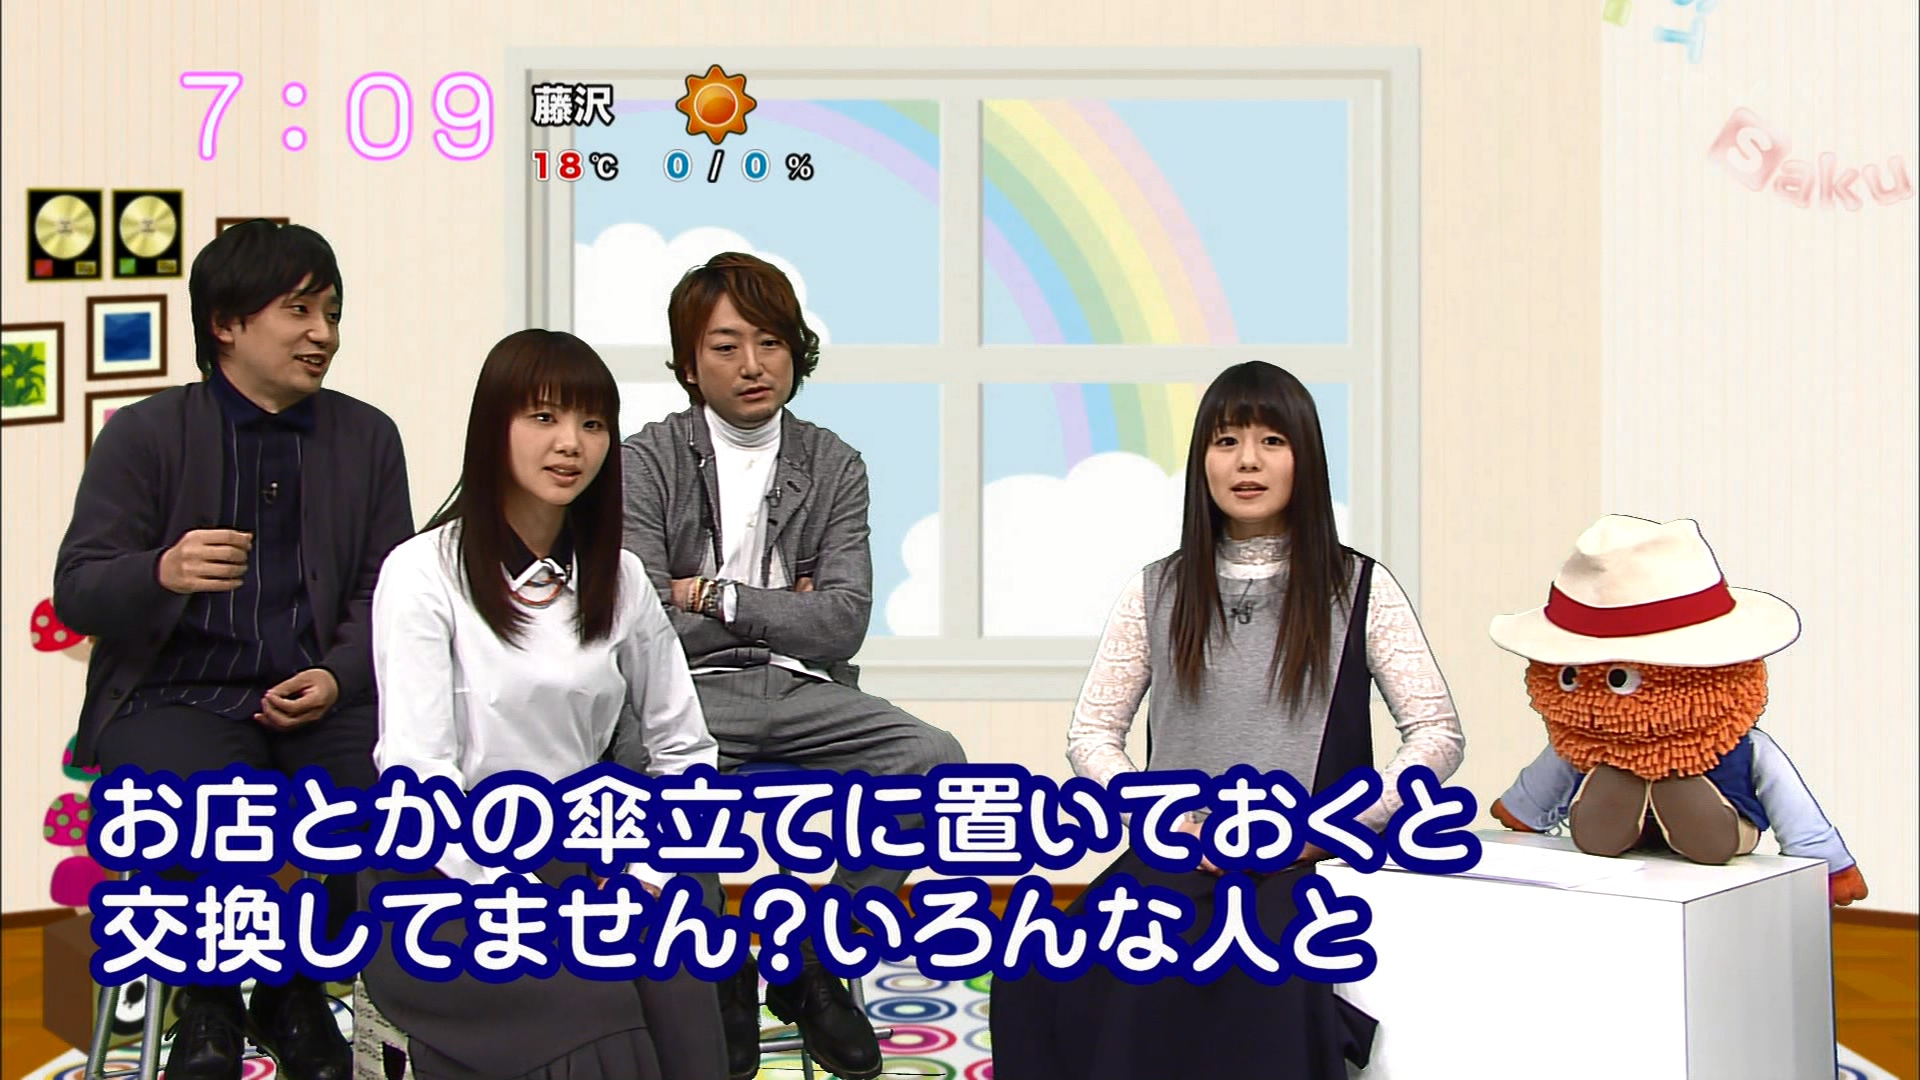 2016.03.17 いきものがかり(saku saku).ts_20160317_080719.650